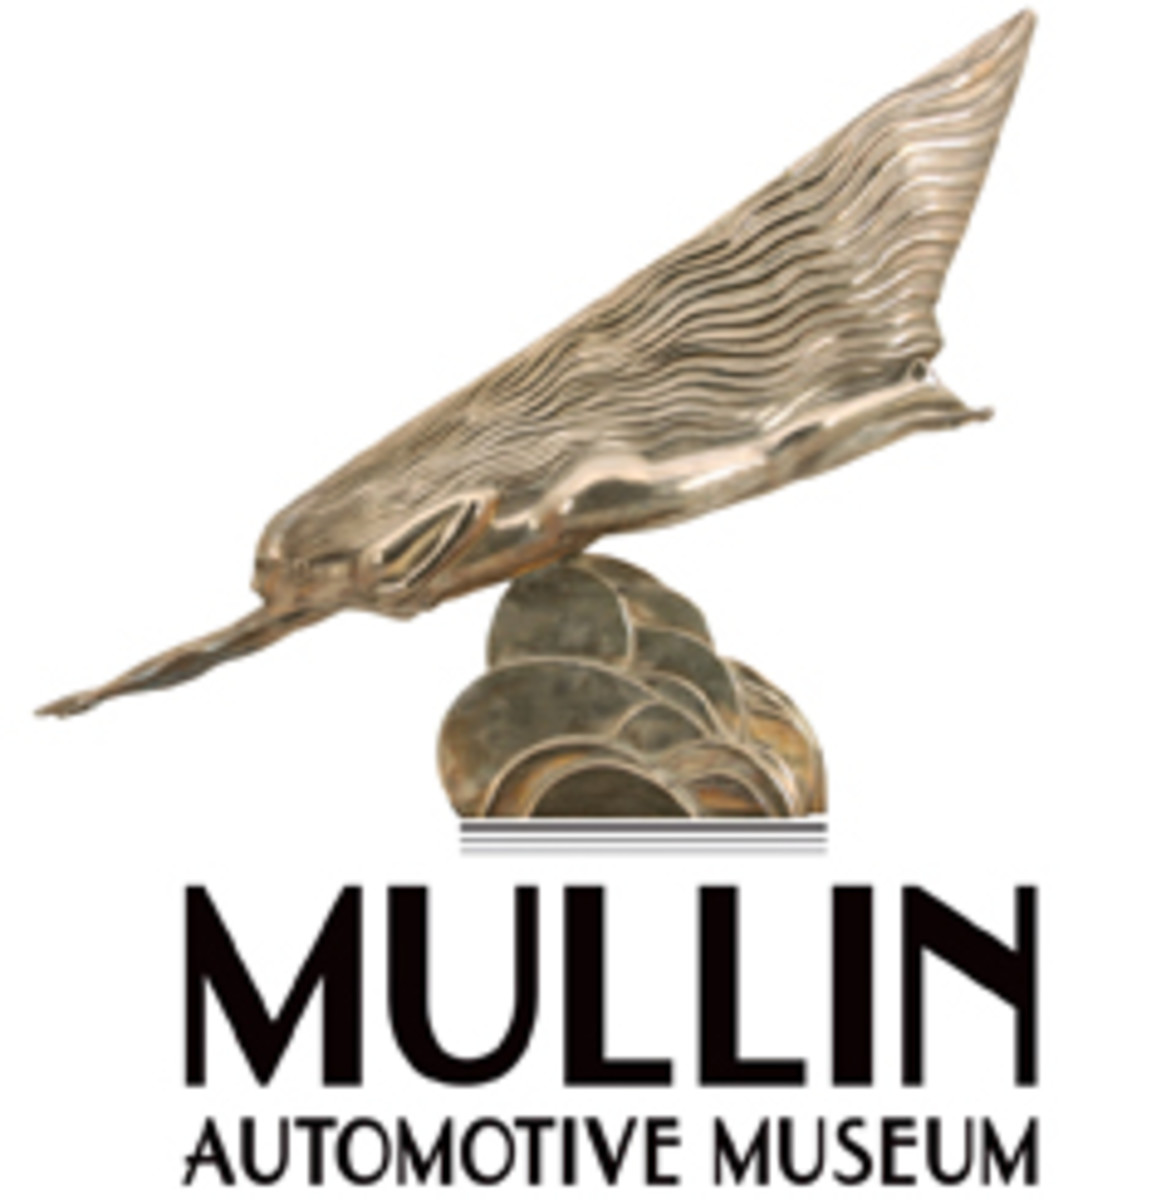 mullin